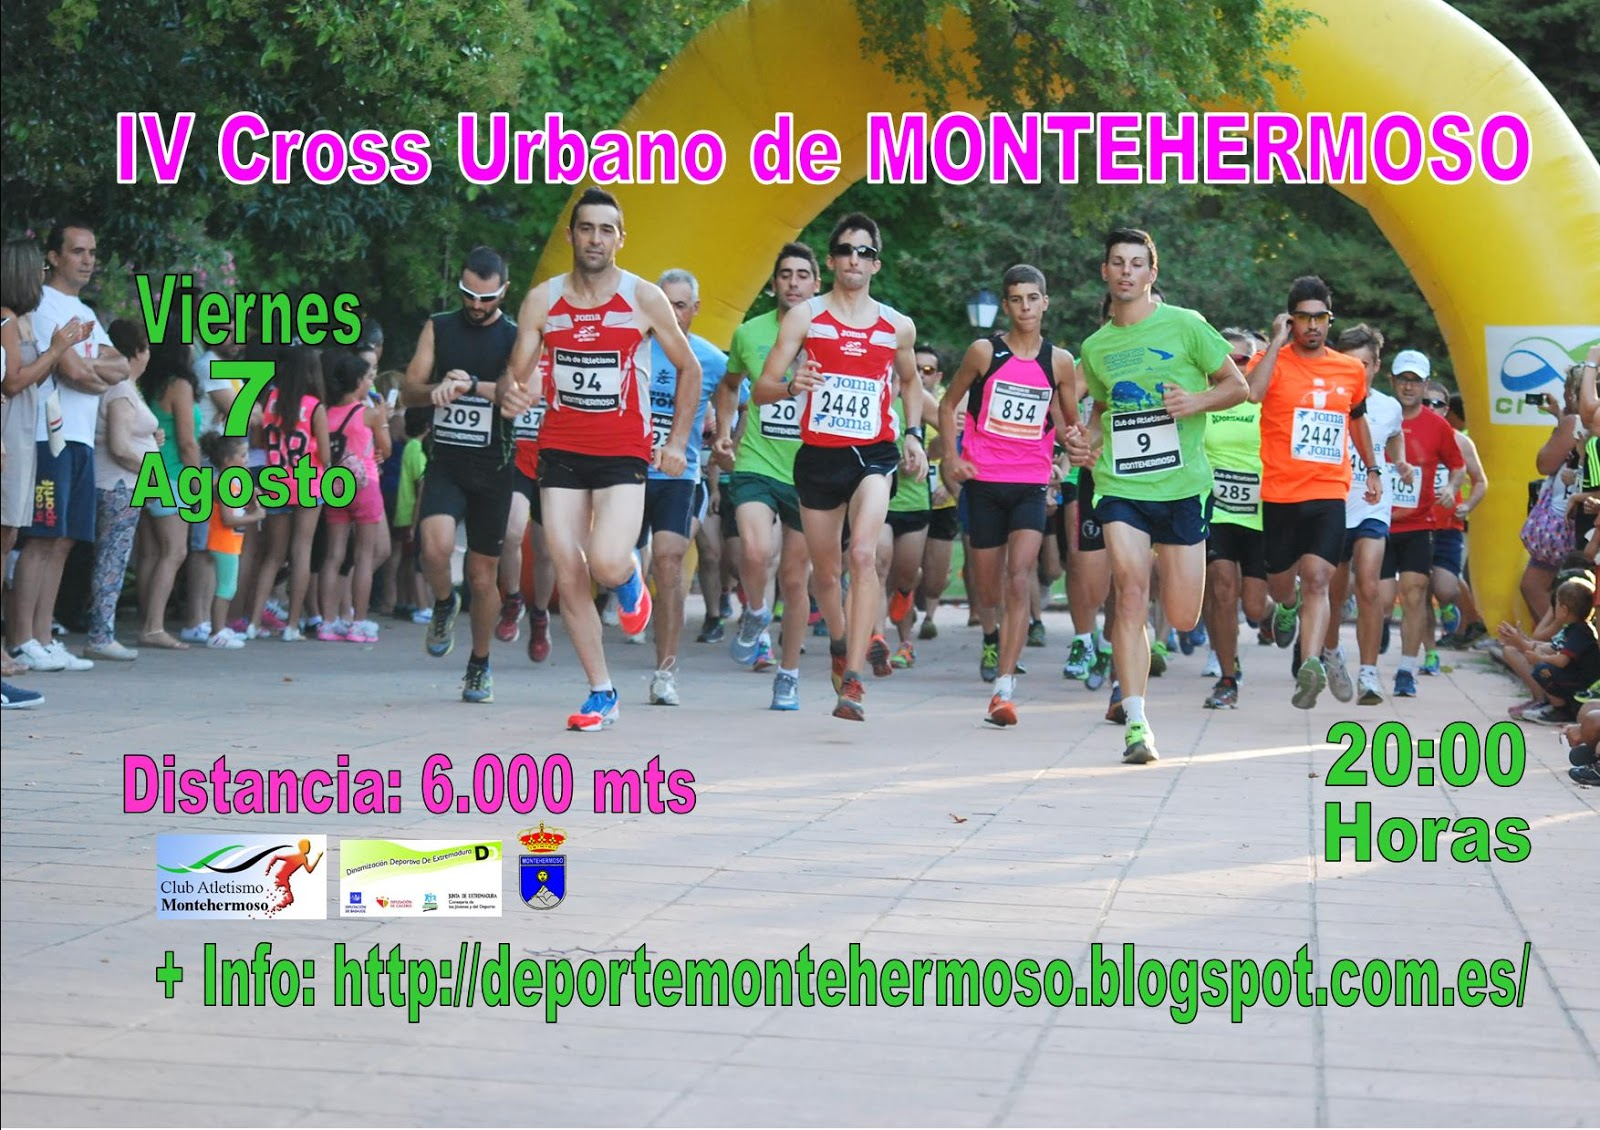 IV Cross Urbano de Montehermoso